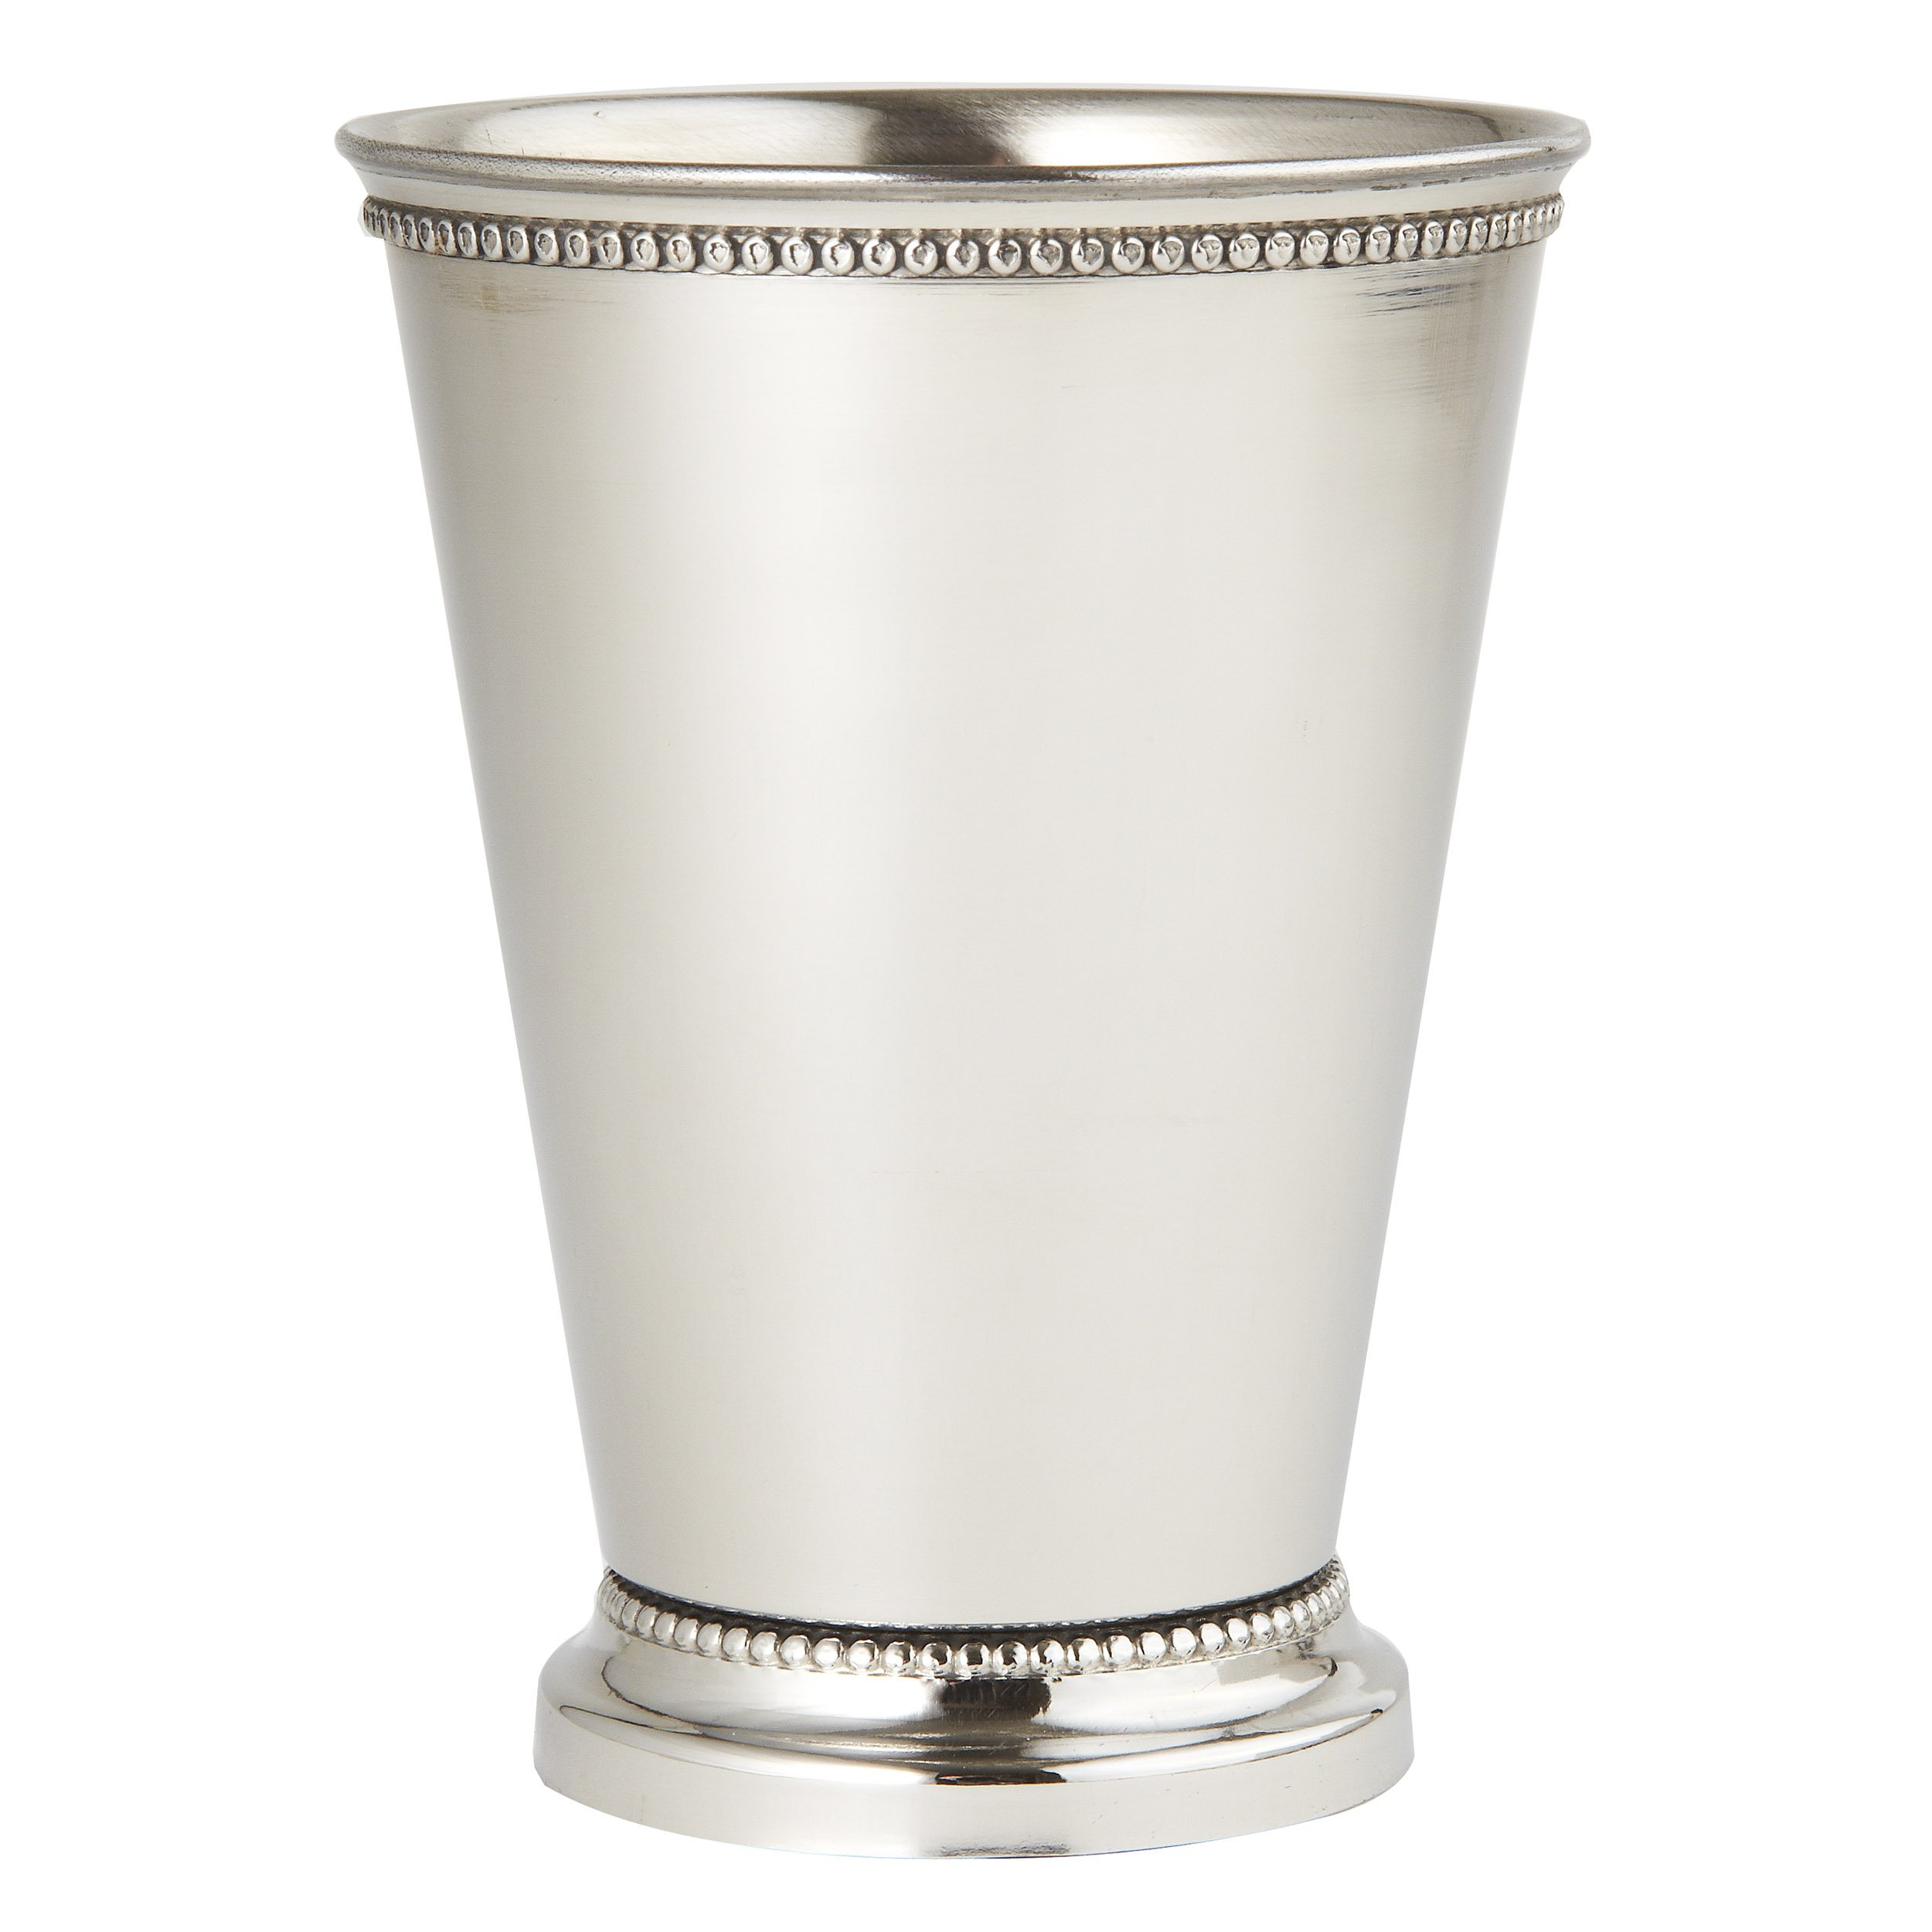 Elegance Beaded Mint Julep Cup - 12 oz. - 4 1/2''